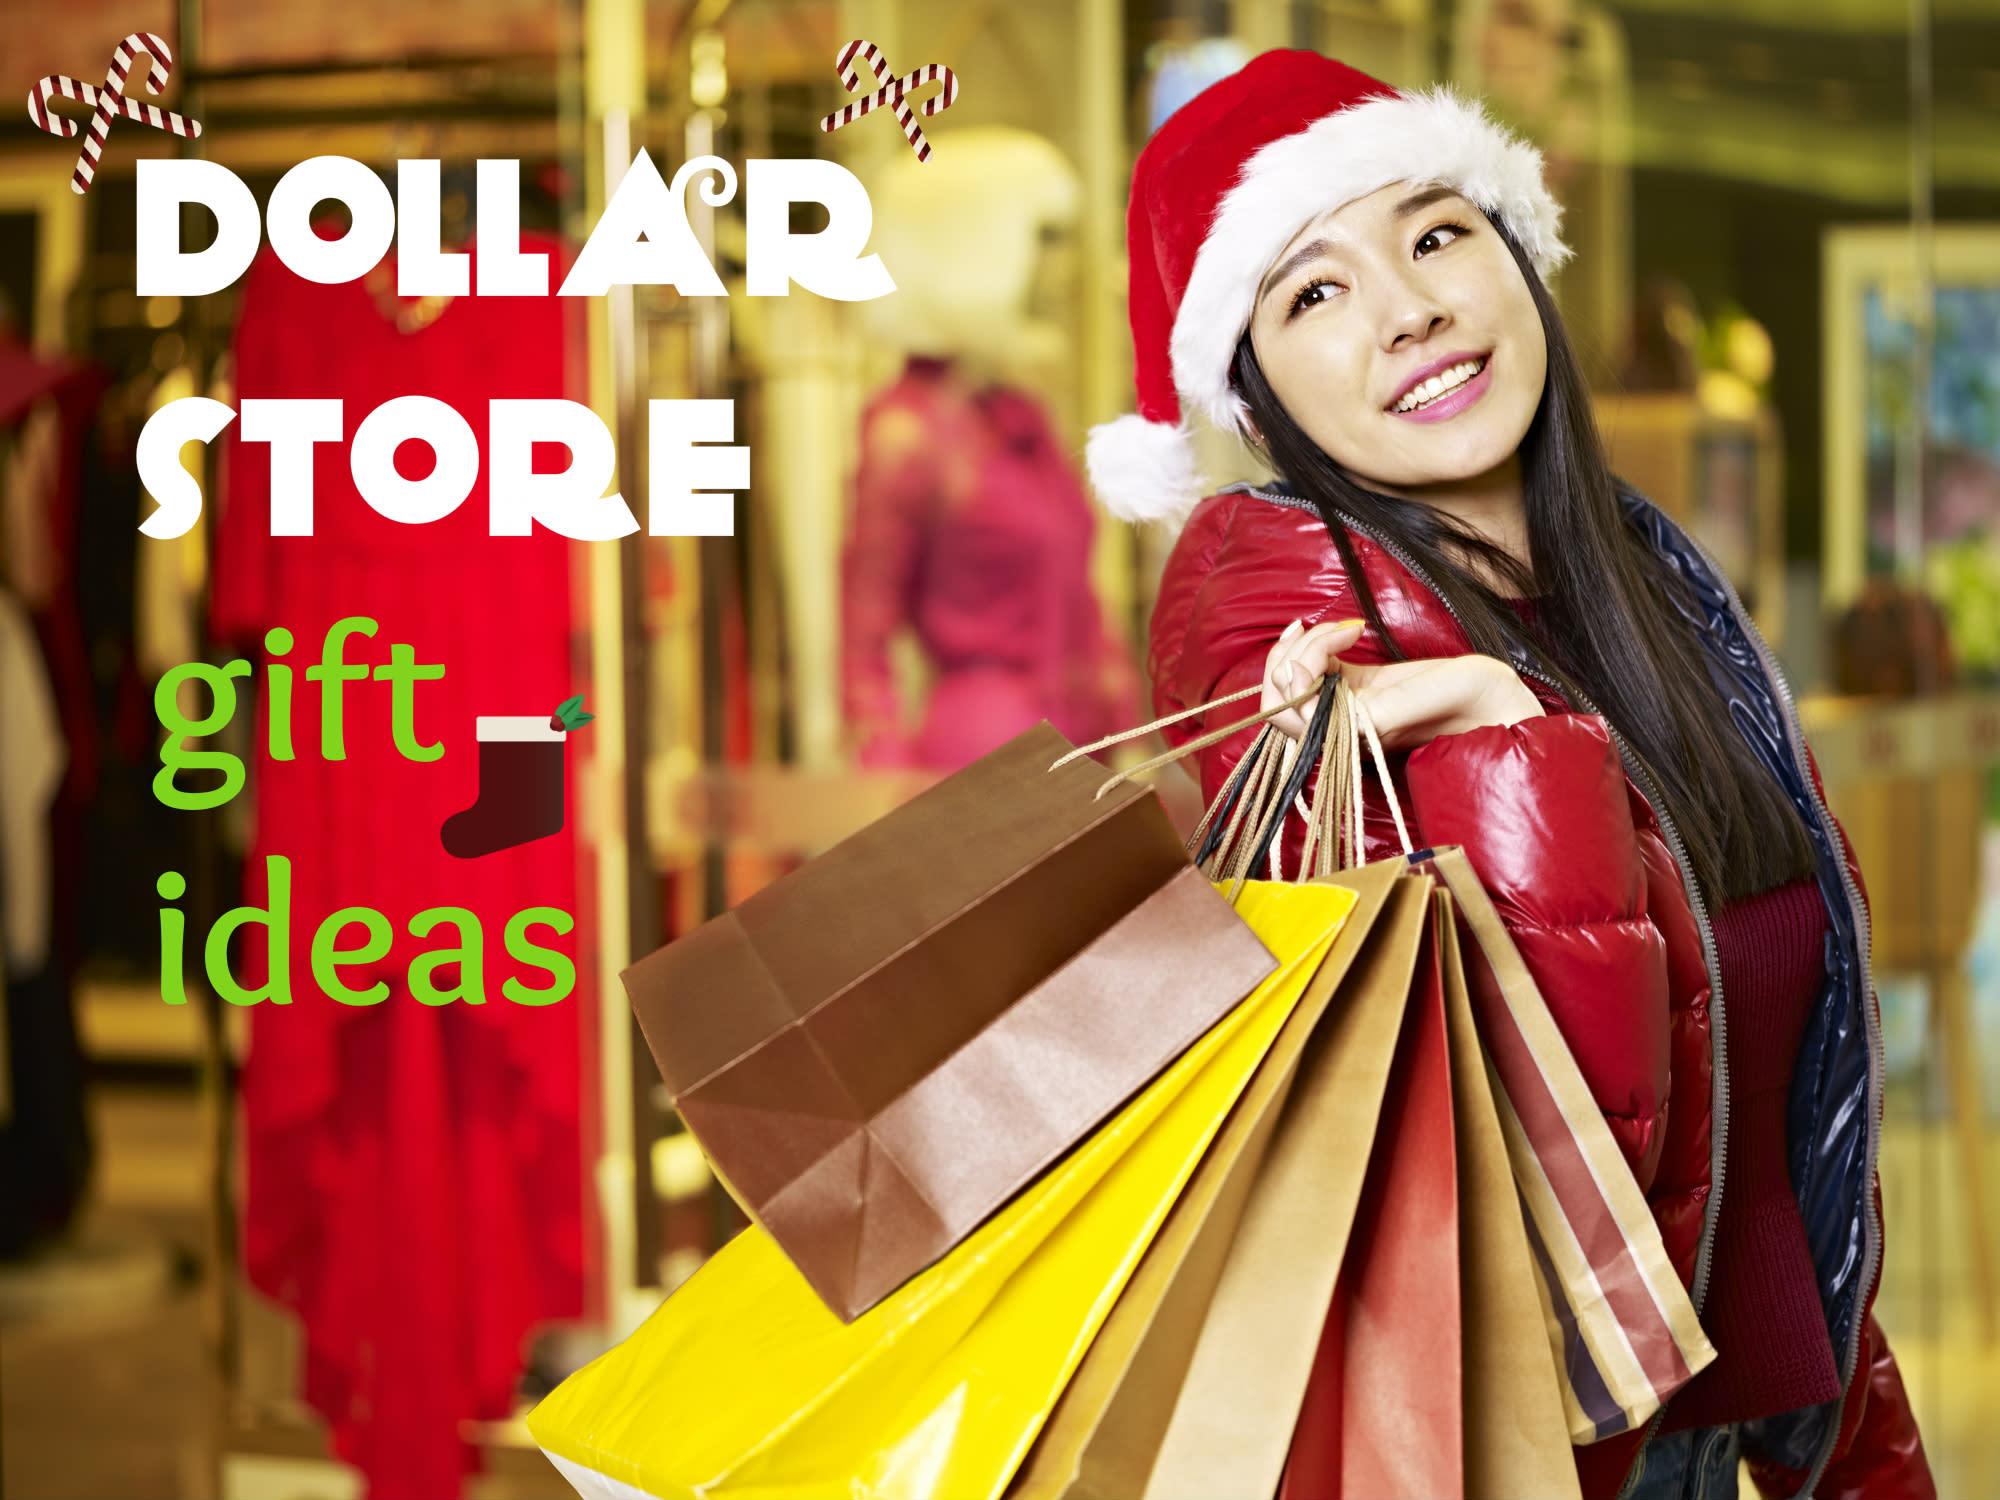 Dollarama Hacks 7 Last Minute Gift Ideas From The Dollar Store